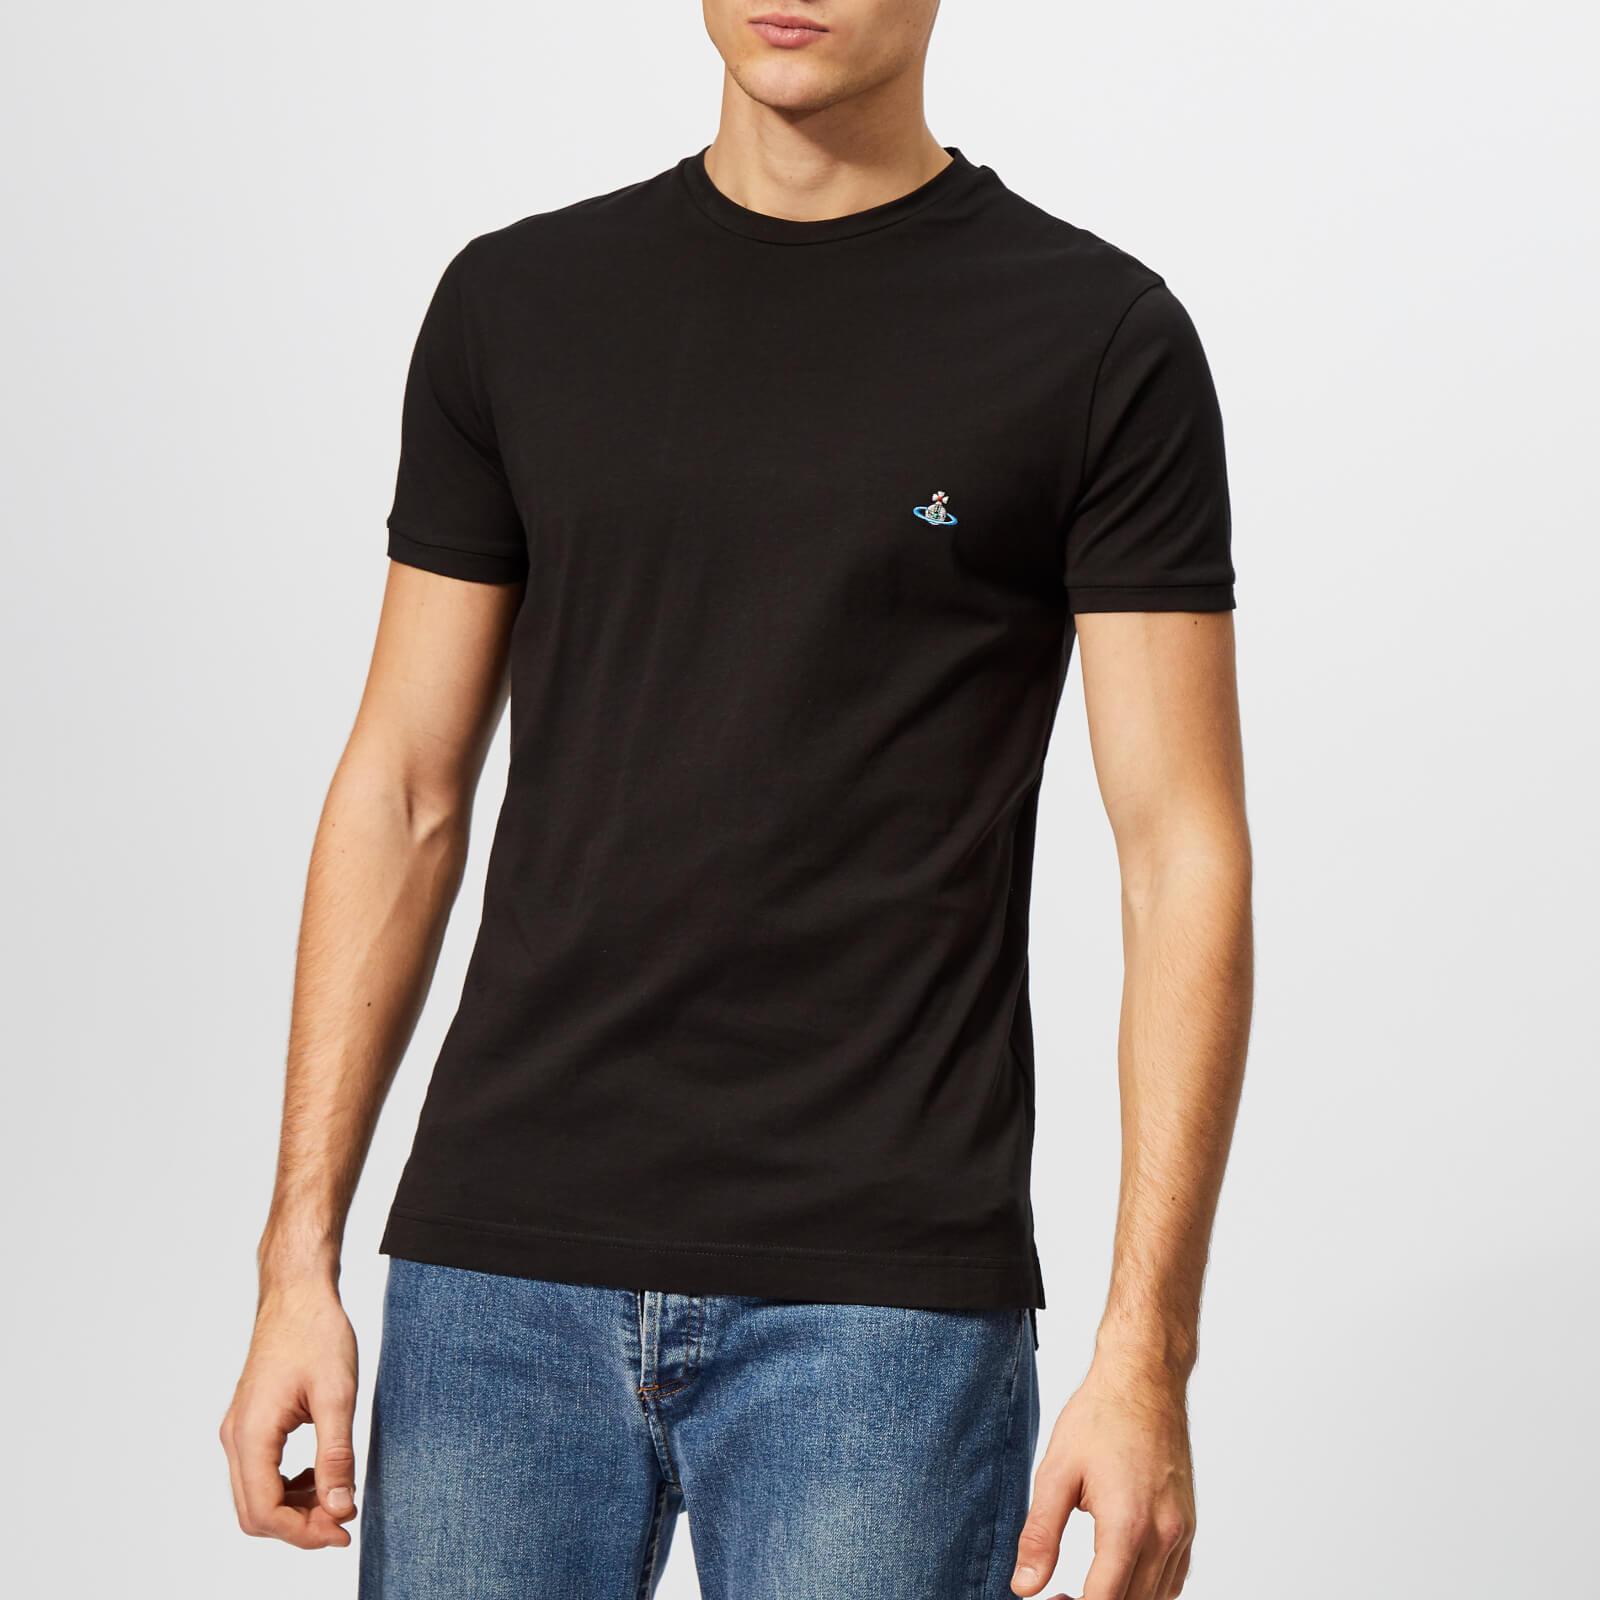 8f6aa076151c Vivienne Westwood Men s Peru T-Shirt - Black - Free UK Delivery over £50